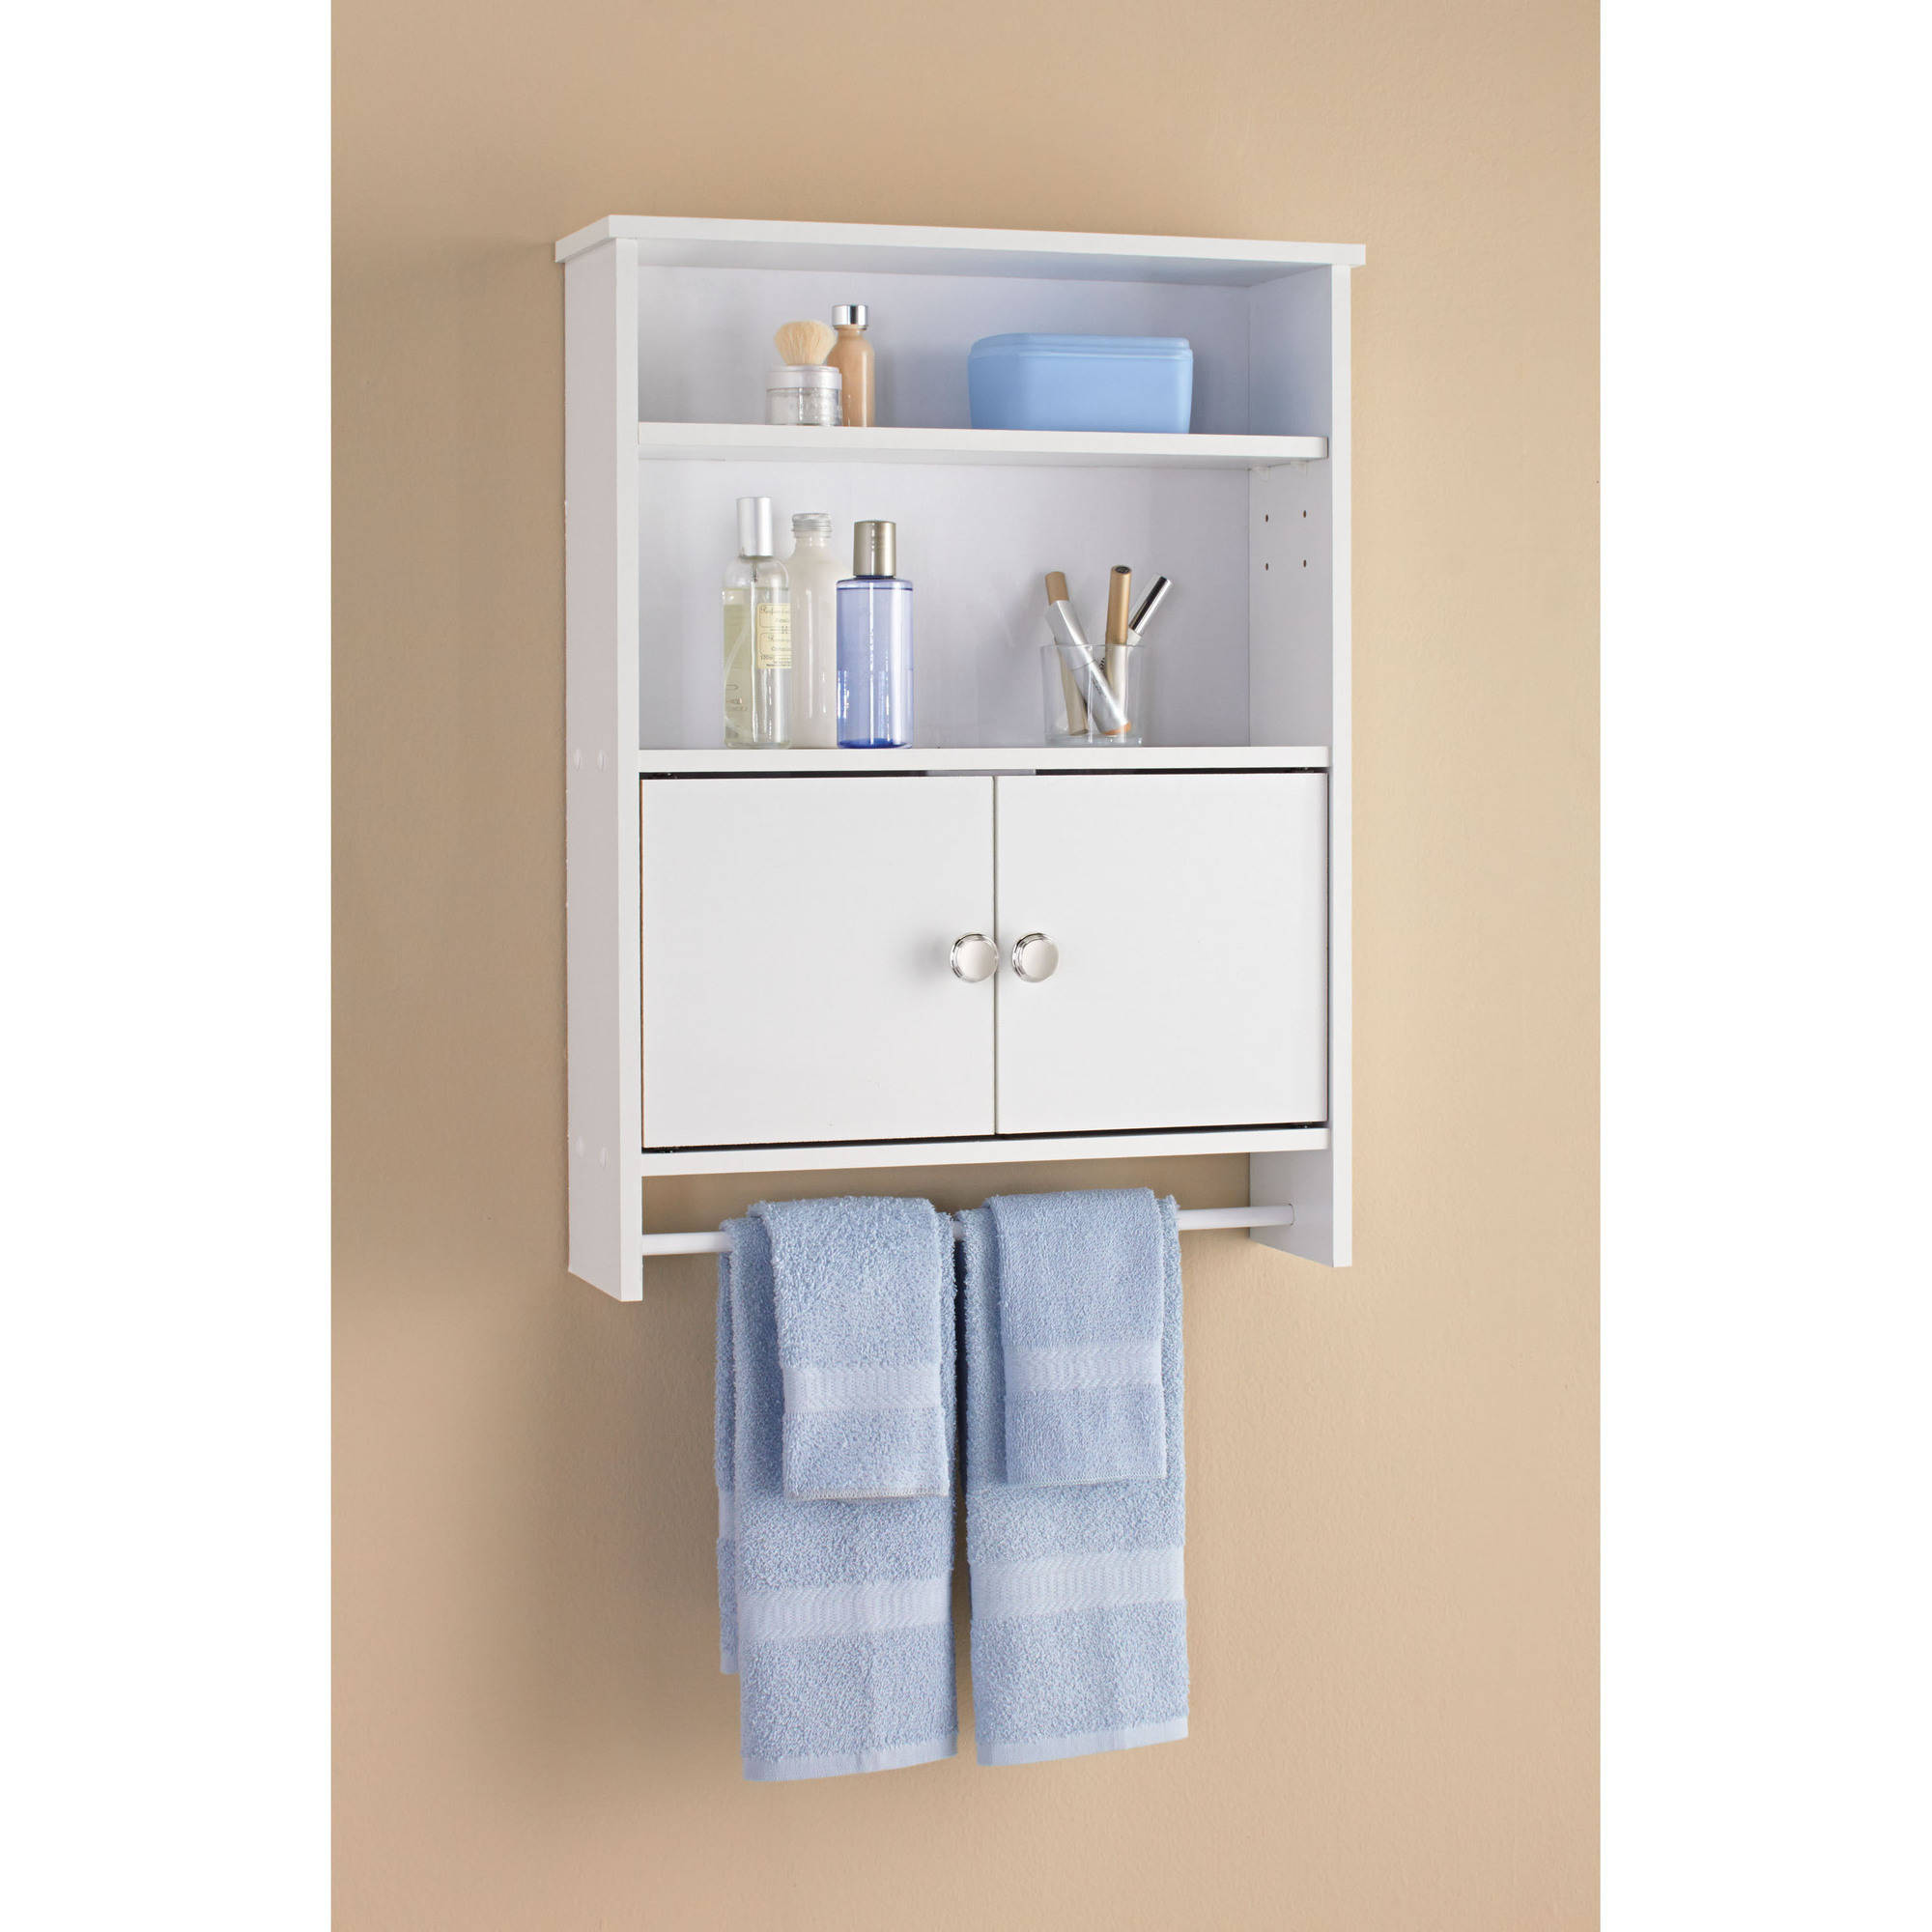 Mainstays 2 Door Bathroom Wall Cabinet White Walmart Com Walmart Com